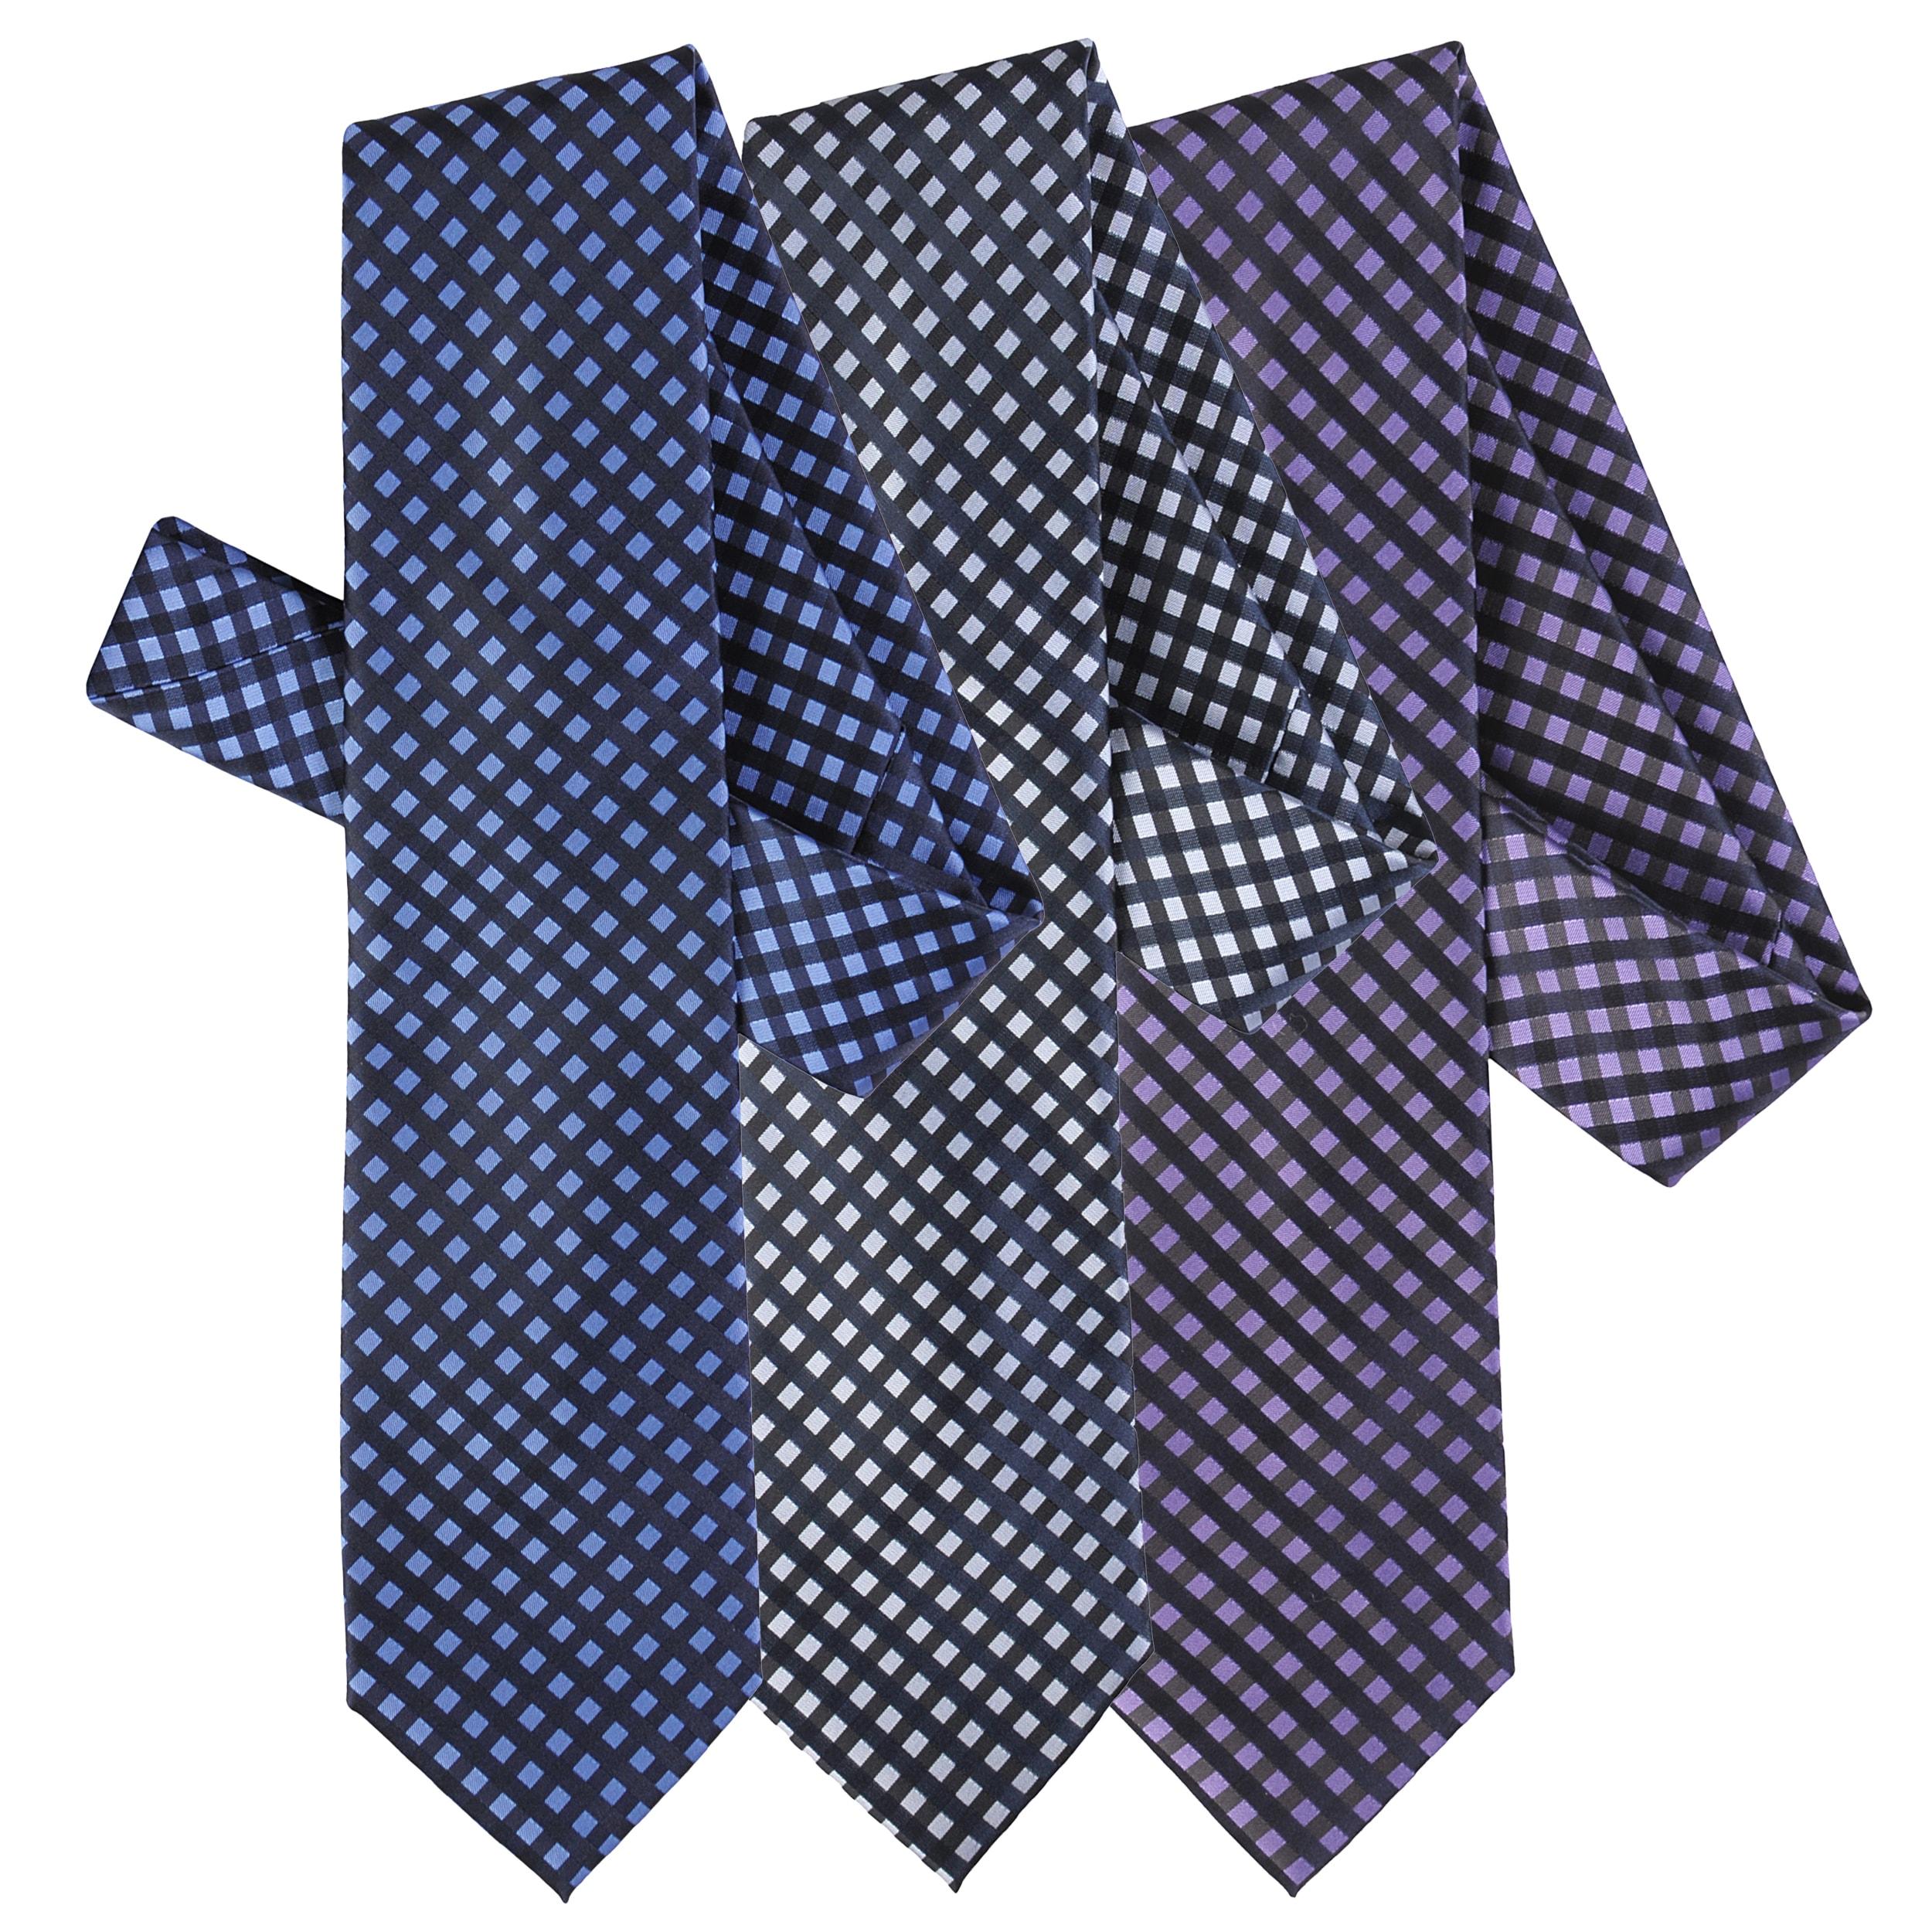 Boston Traveler Men's Window Pane Print Microfiber Tie and Hanky Set